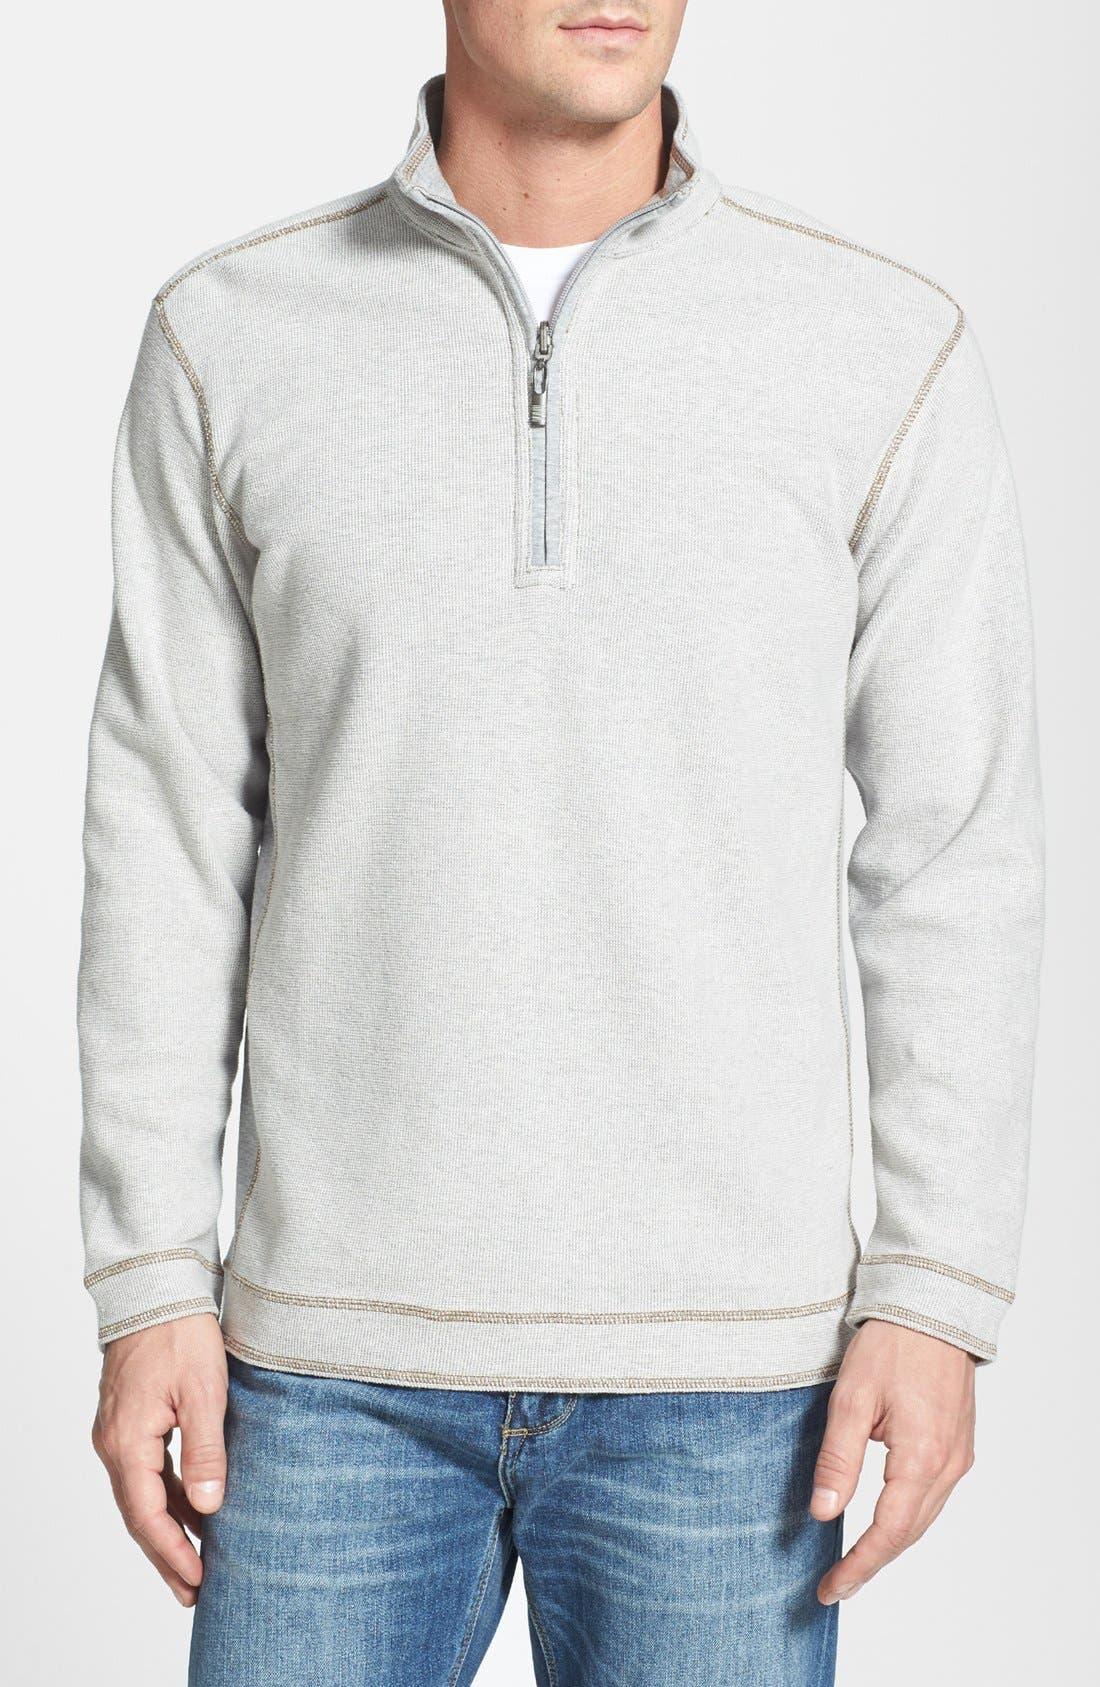 Main Image - Tommy Bahama Denim 'Grand Isles' Reversible Half Zip Sweatshirt